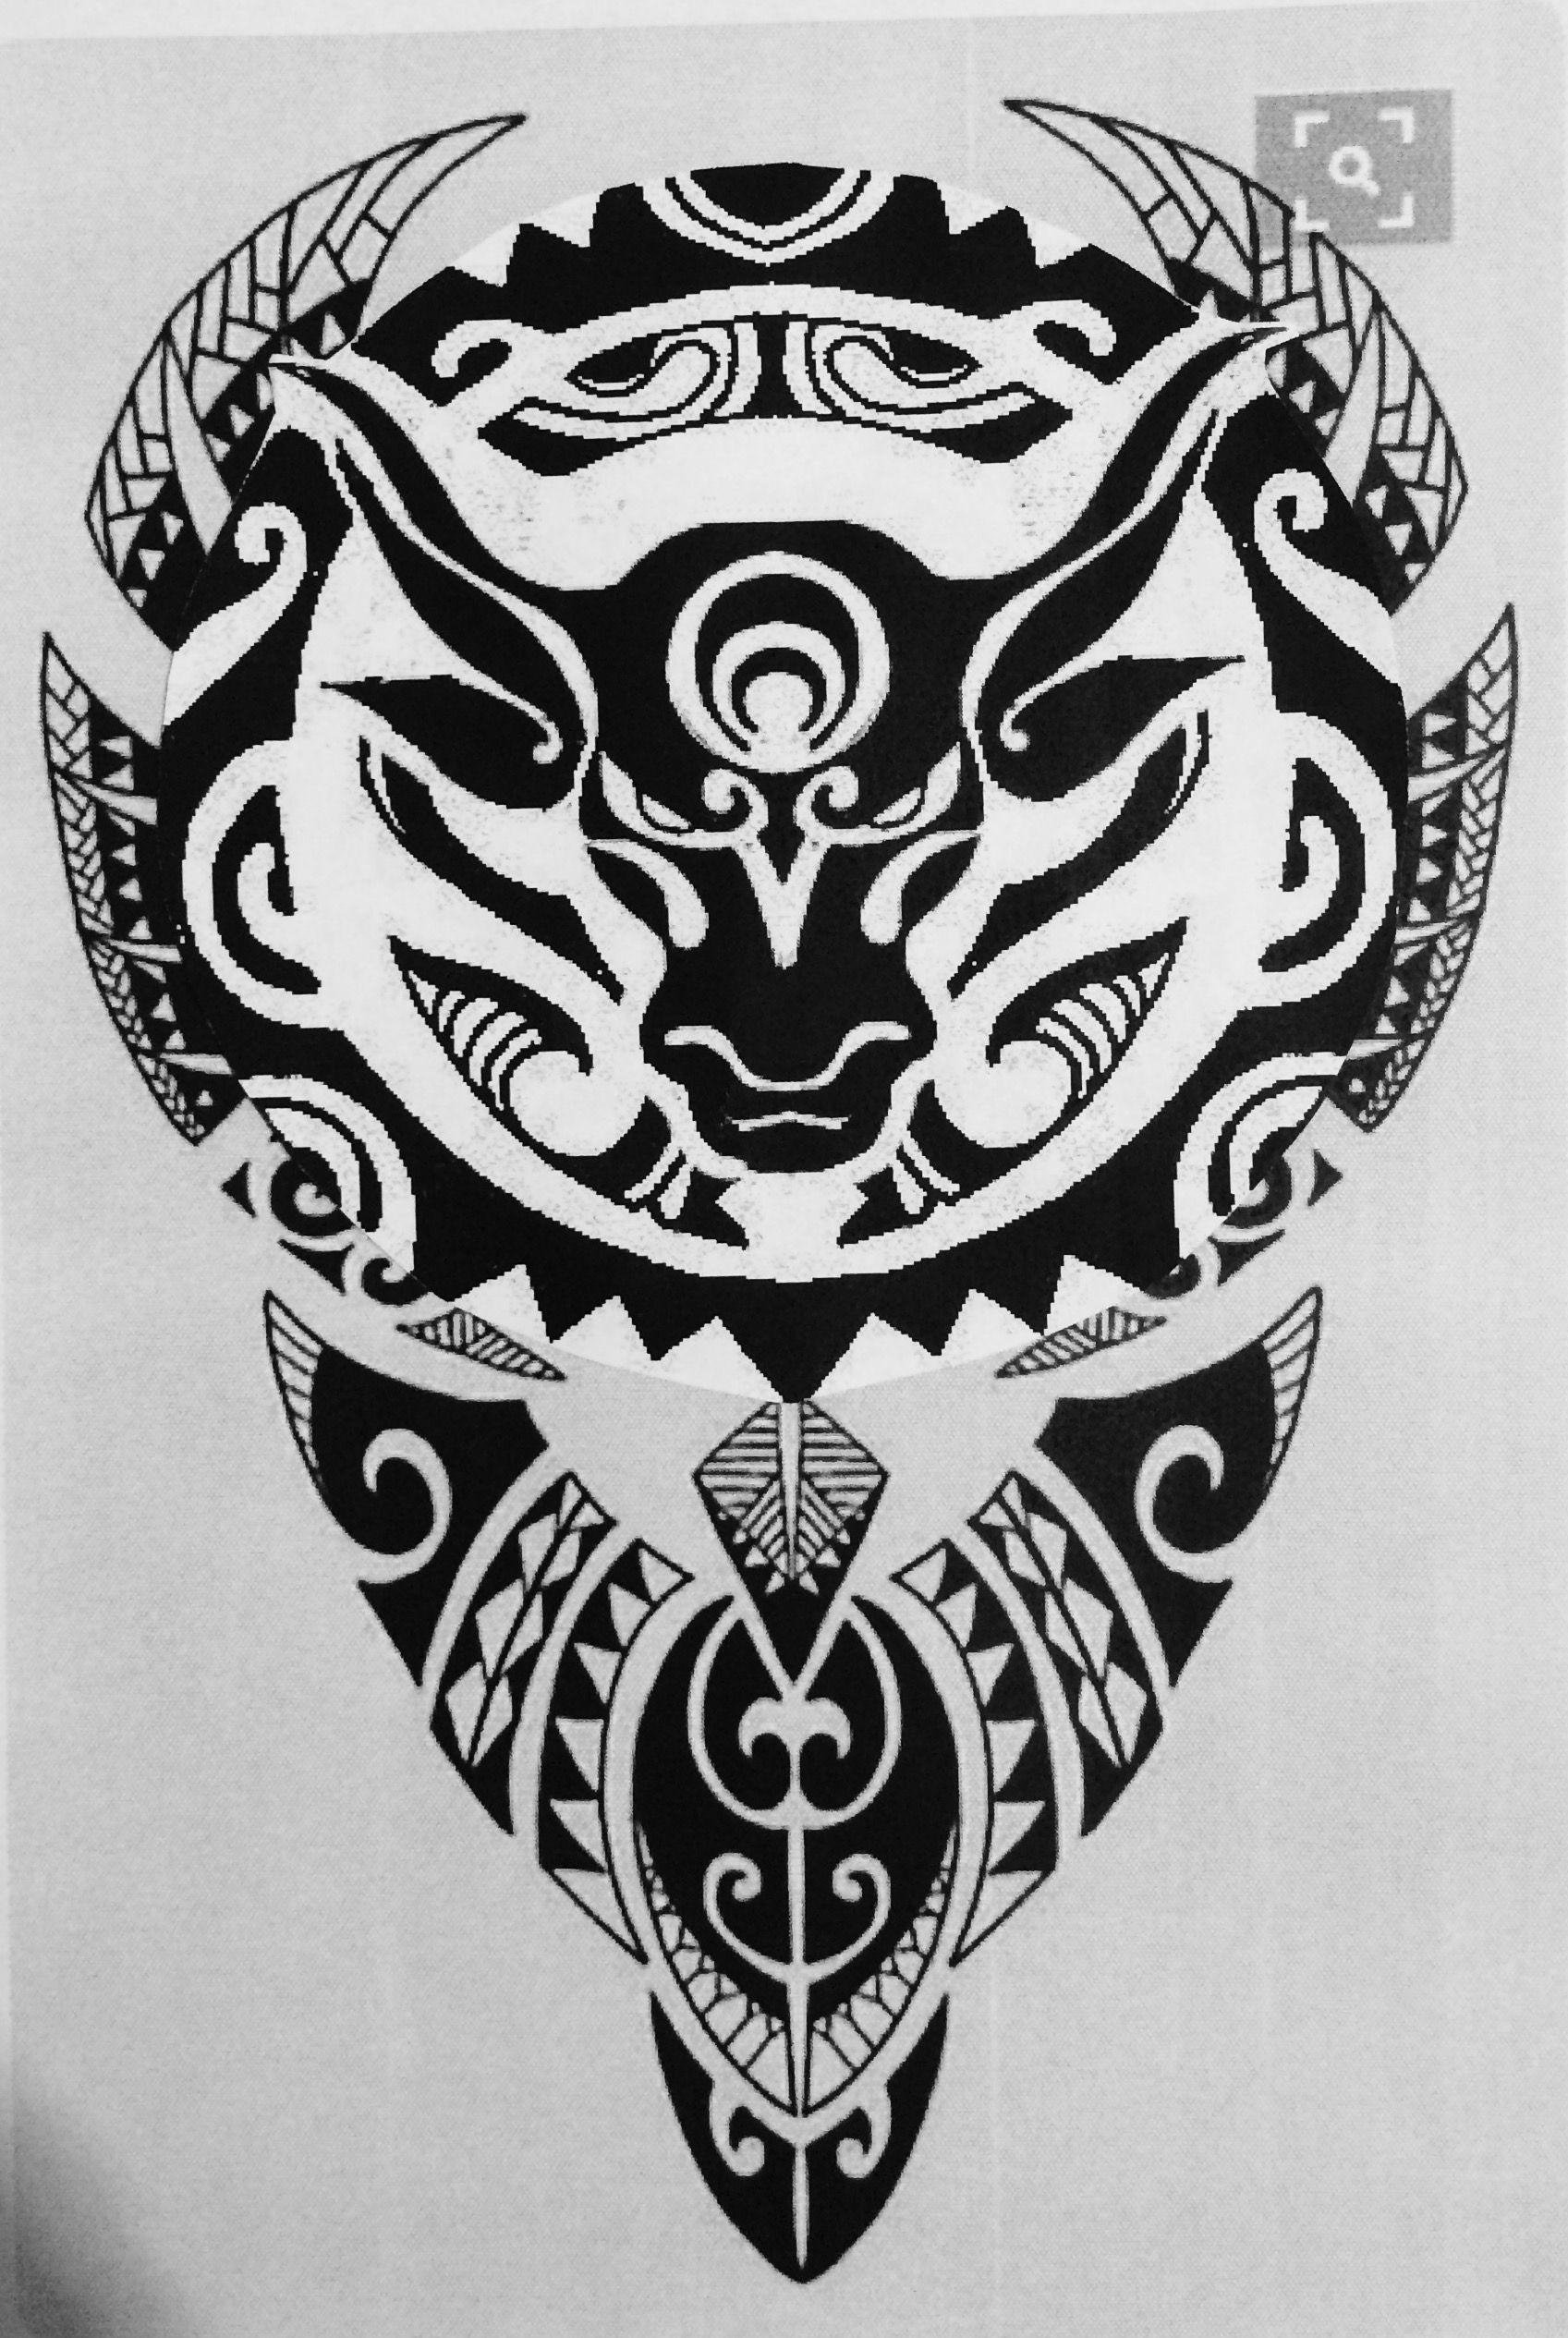 Pin de Luis Mendez en mis cosas Pinterest Tatuajes Tauro y